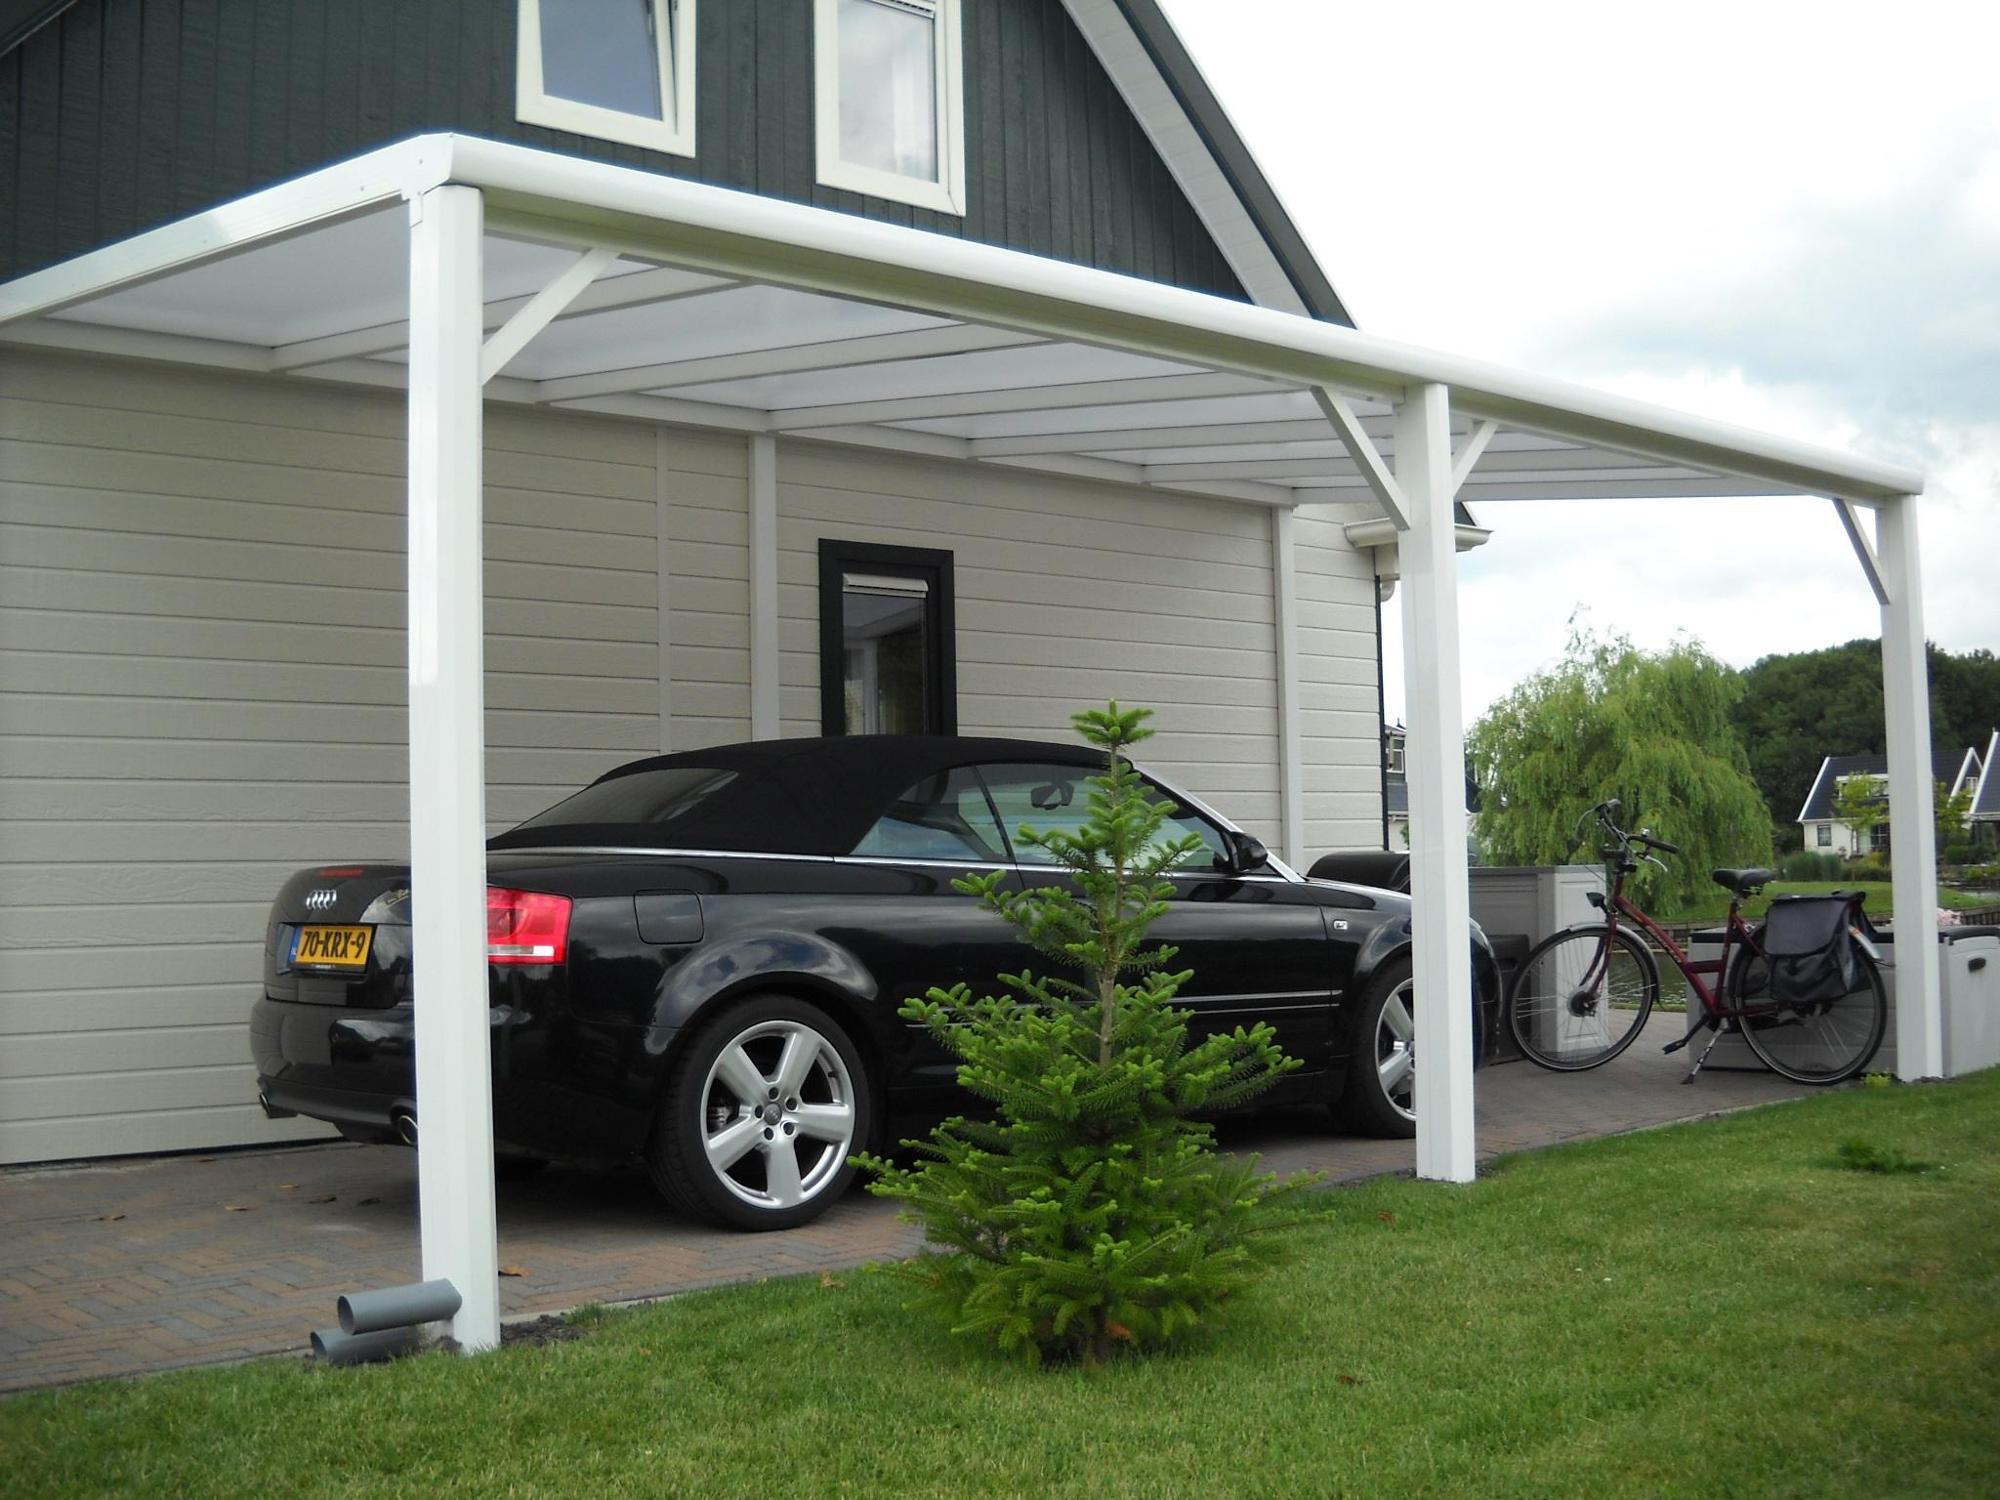 Luxury Aluminum Frame Wall Mounted Carport Garages Lean To Carport Canopy Buy Wall Mounted Carport Aluminum Carport Lean To Carport Product On Alibaba Com